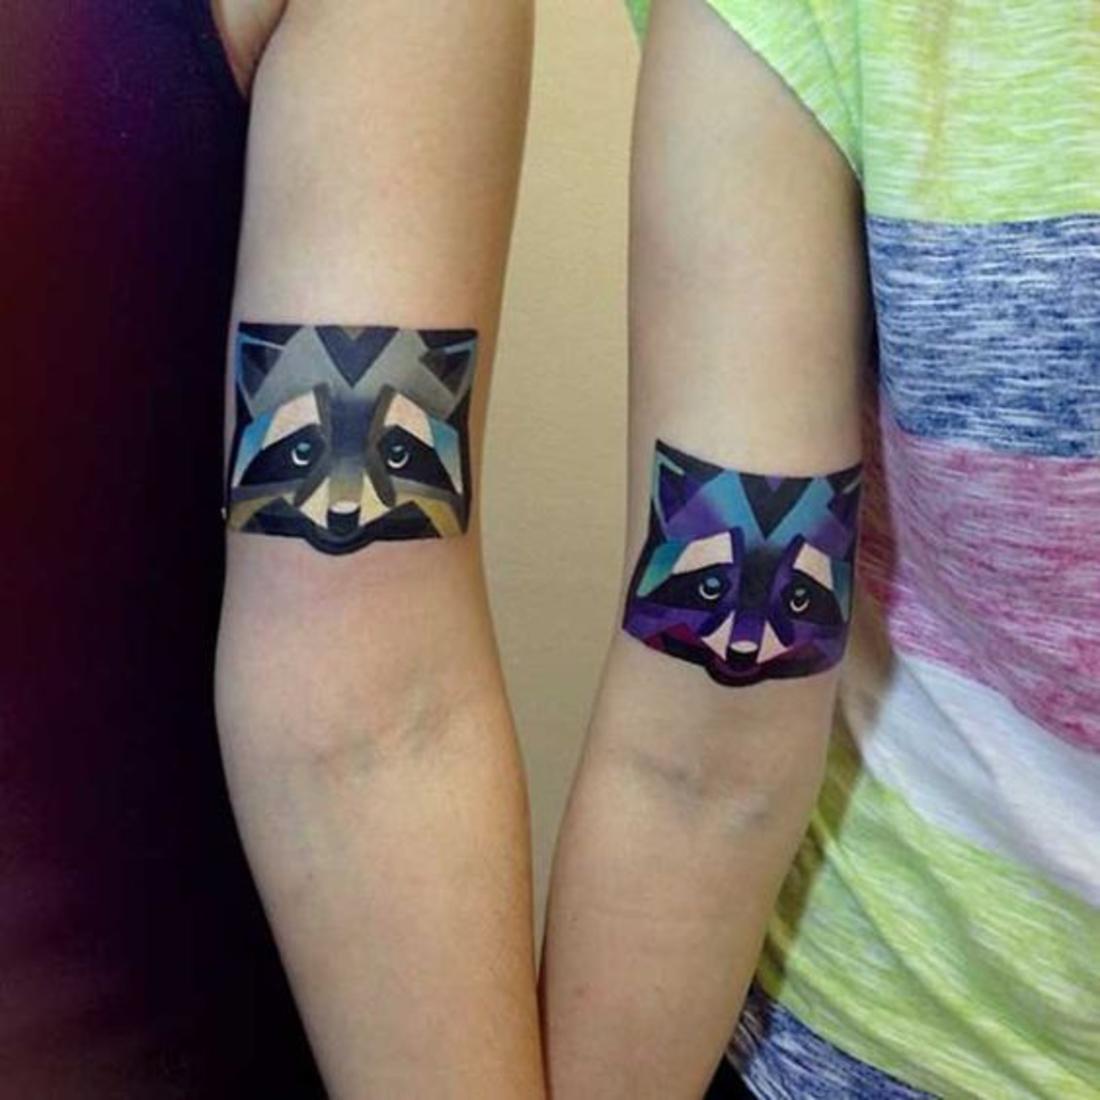 tatuajes parejas, bonitos tatuajes de zorros, zorro masculino, zorro femenino, interesante